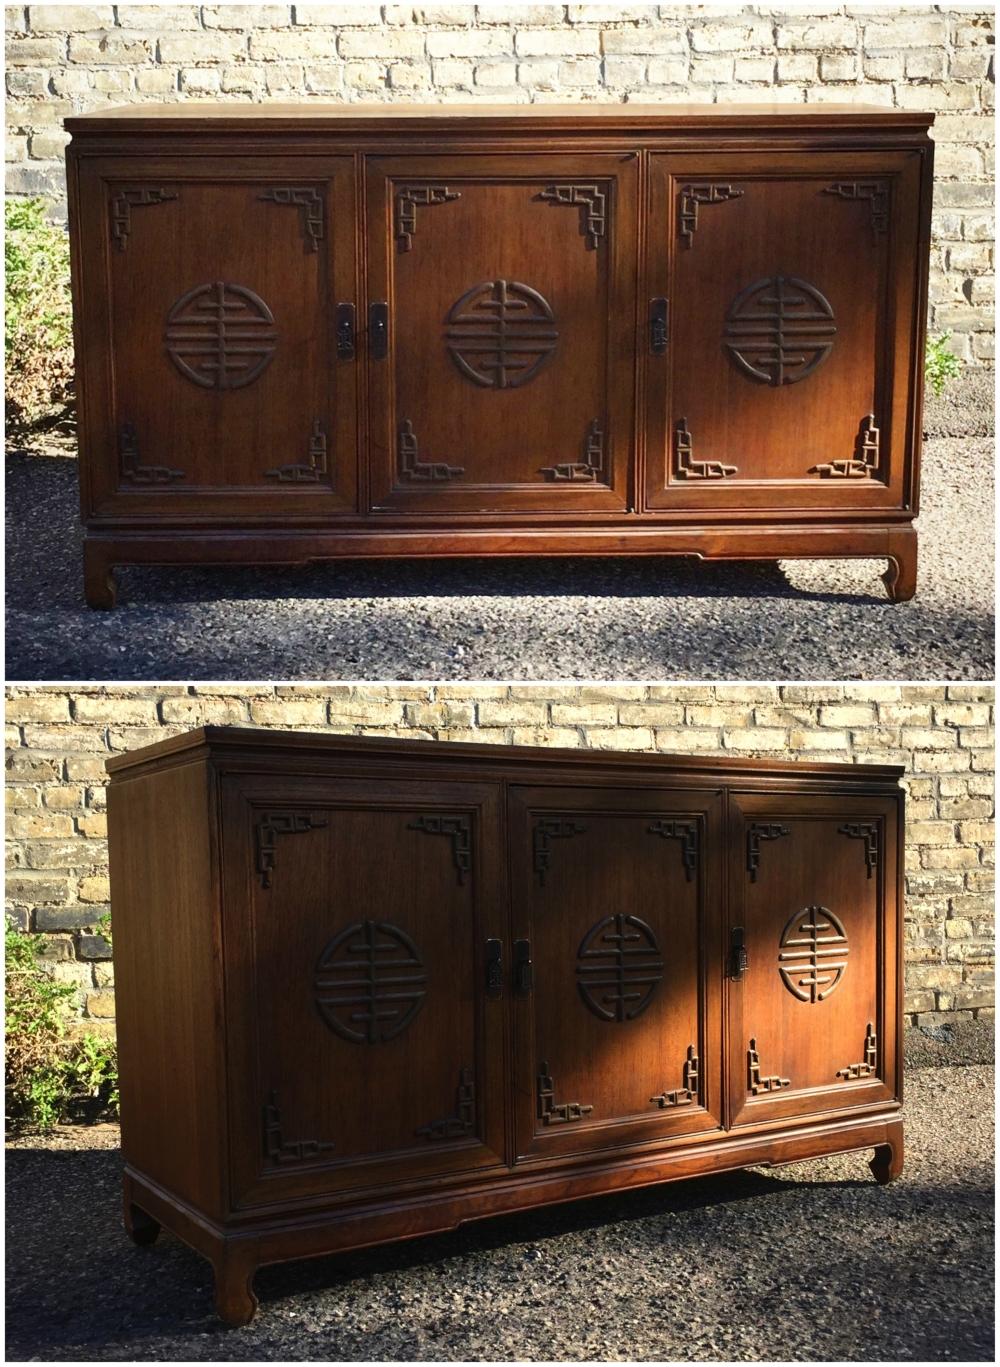 Asian style sideboard - credenza - vintage - antique